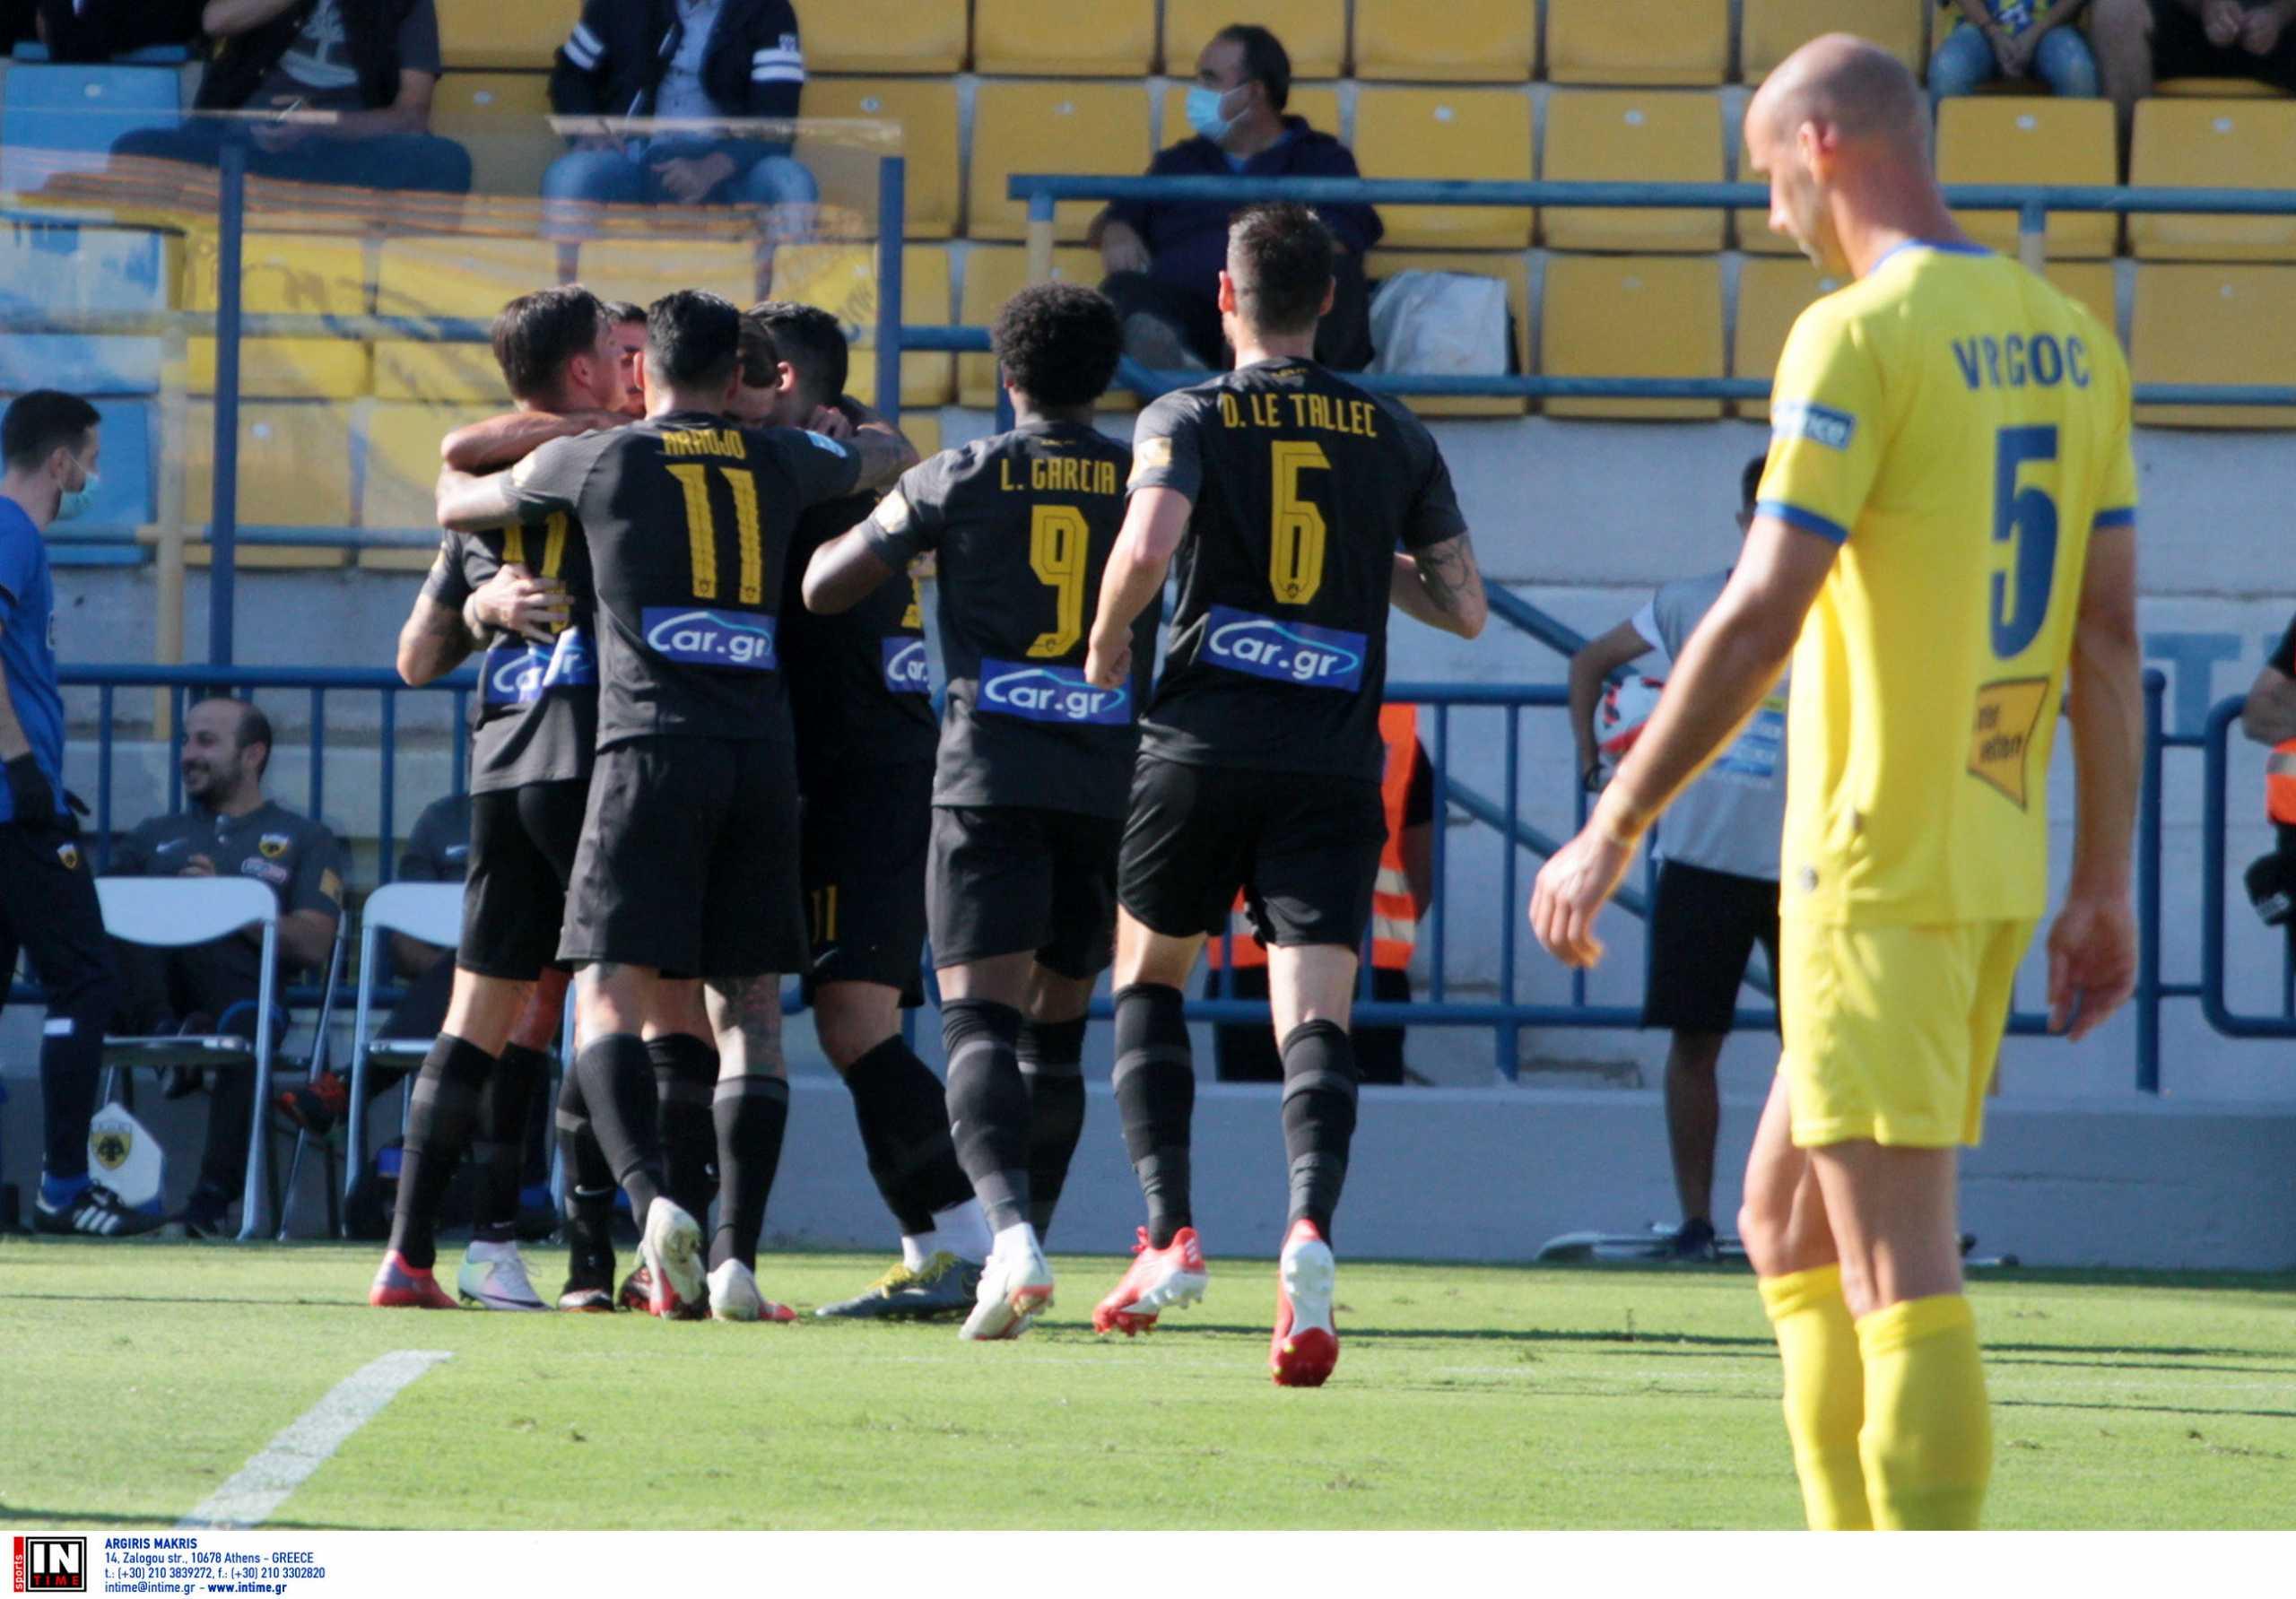 Superleague 1, Παναιτωλικός – ΑΕΚ 1-3: «Διπρόσωπη» και πάλι αλλά νικήτρια στο Αγρίνιο